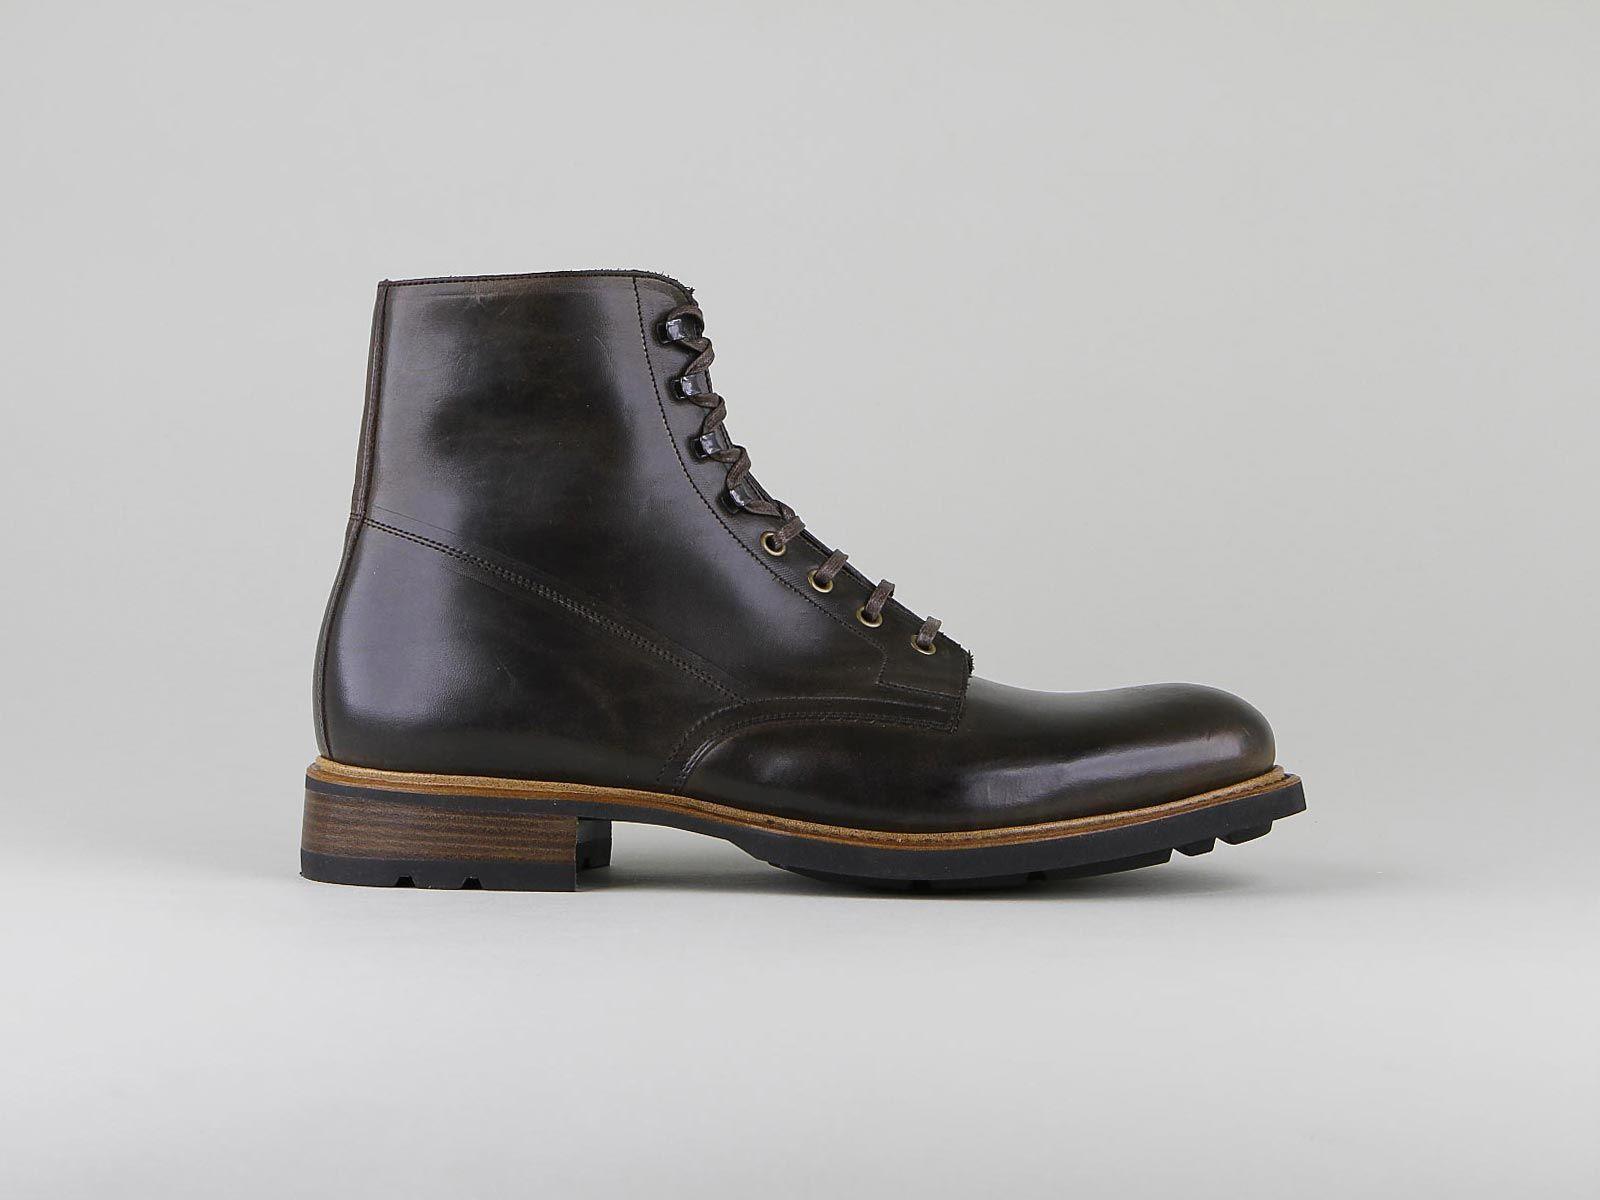 ea1ef8043 Paraboot SCOTT - Chaussures Homme - Montants | mode en 2019 ...